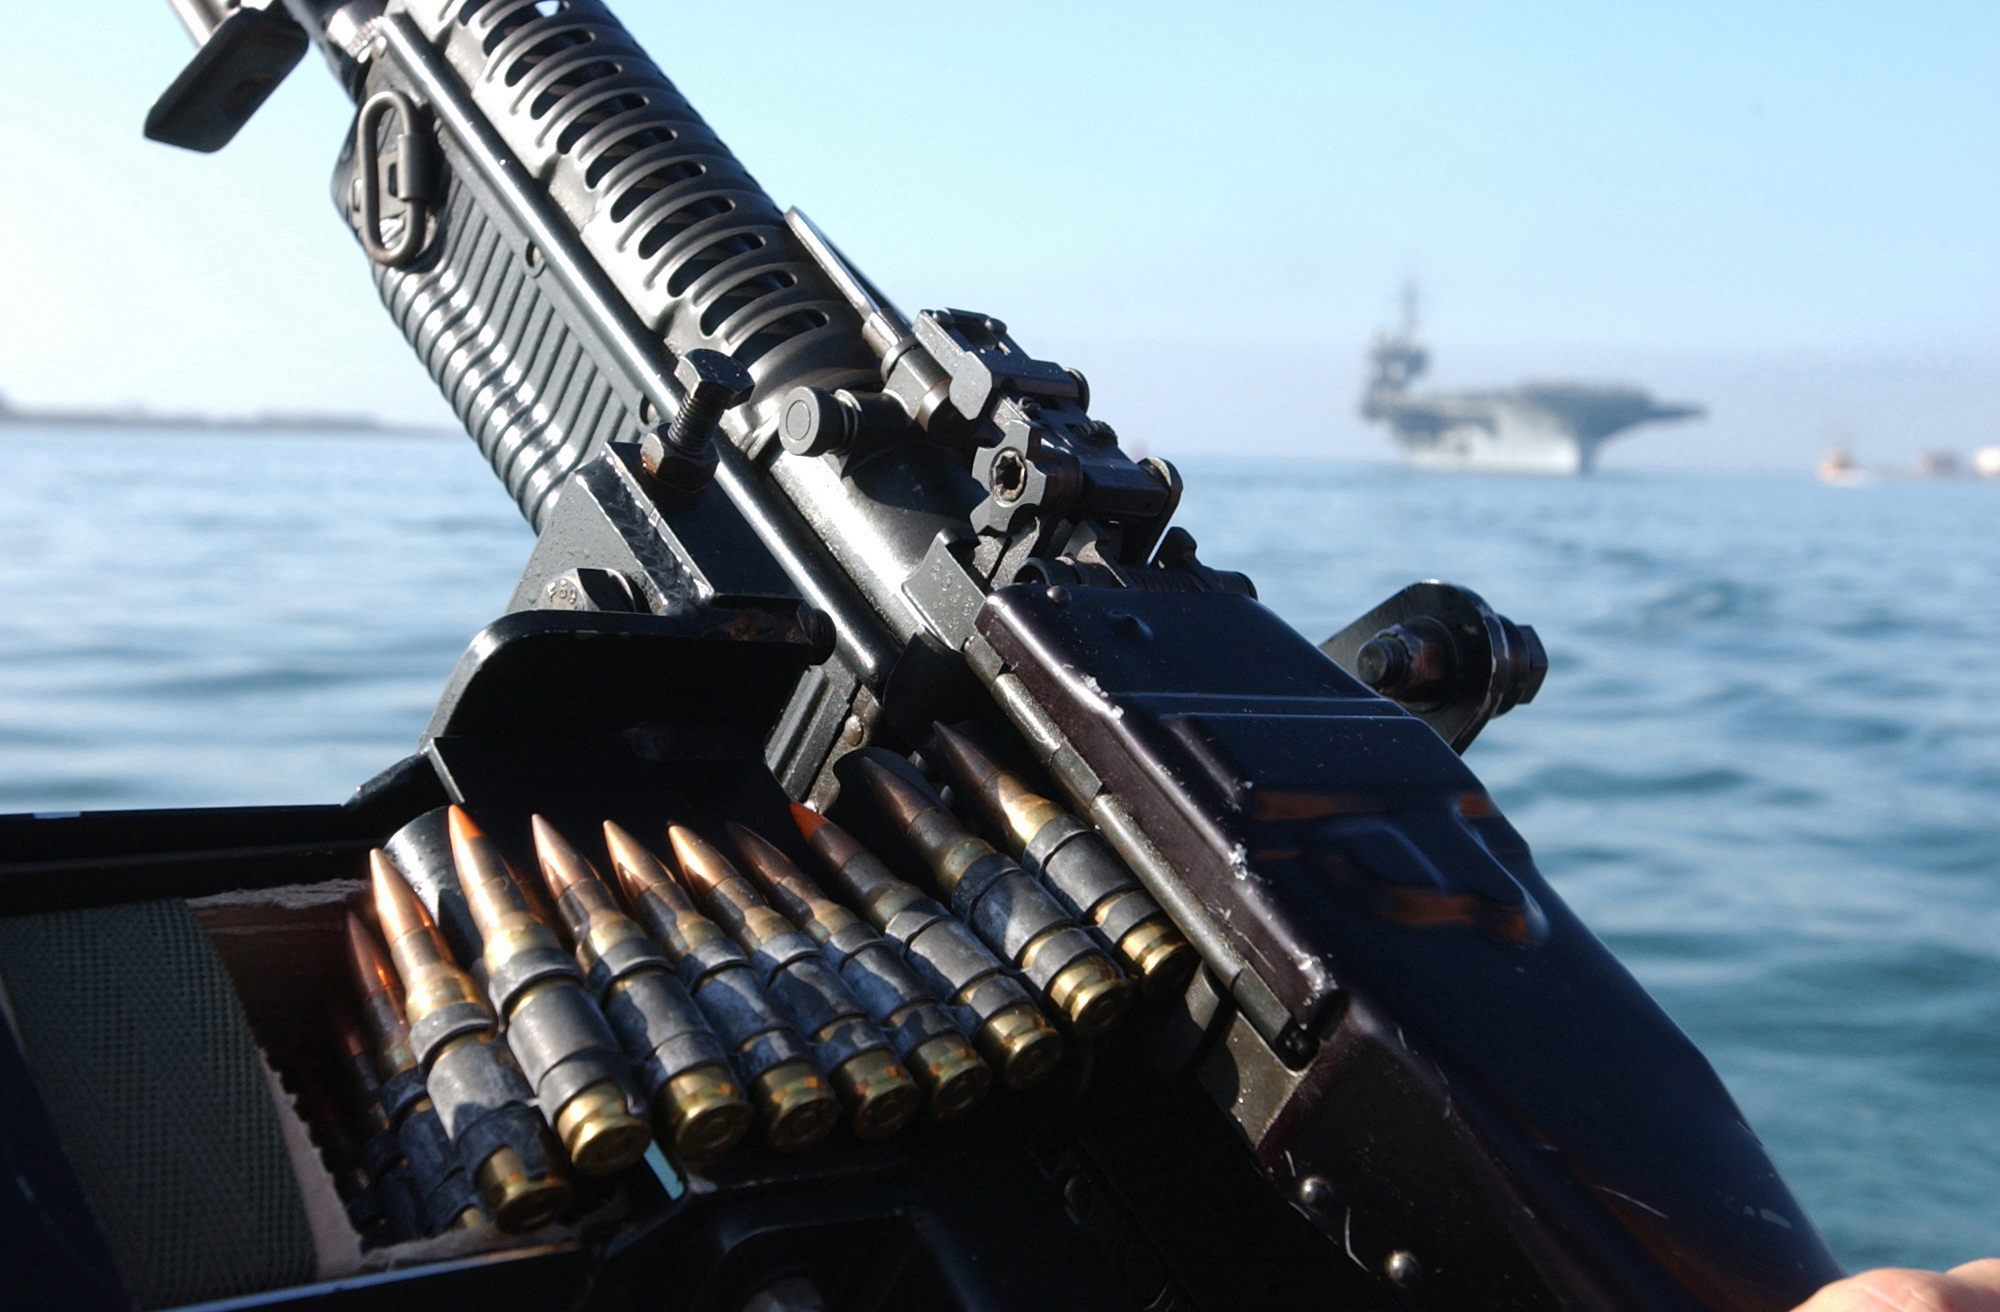 M60 MACHINE GUN military rifle weapon ammo g wallpaper background 2000x1312